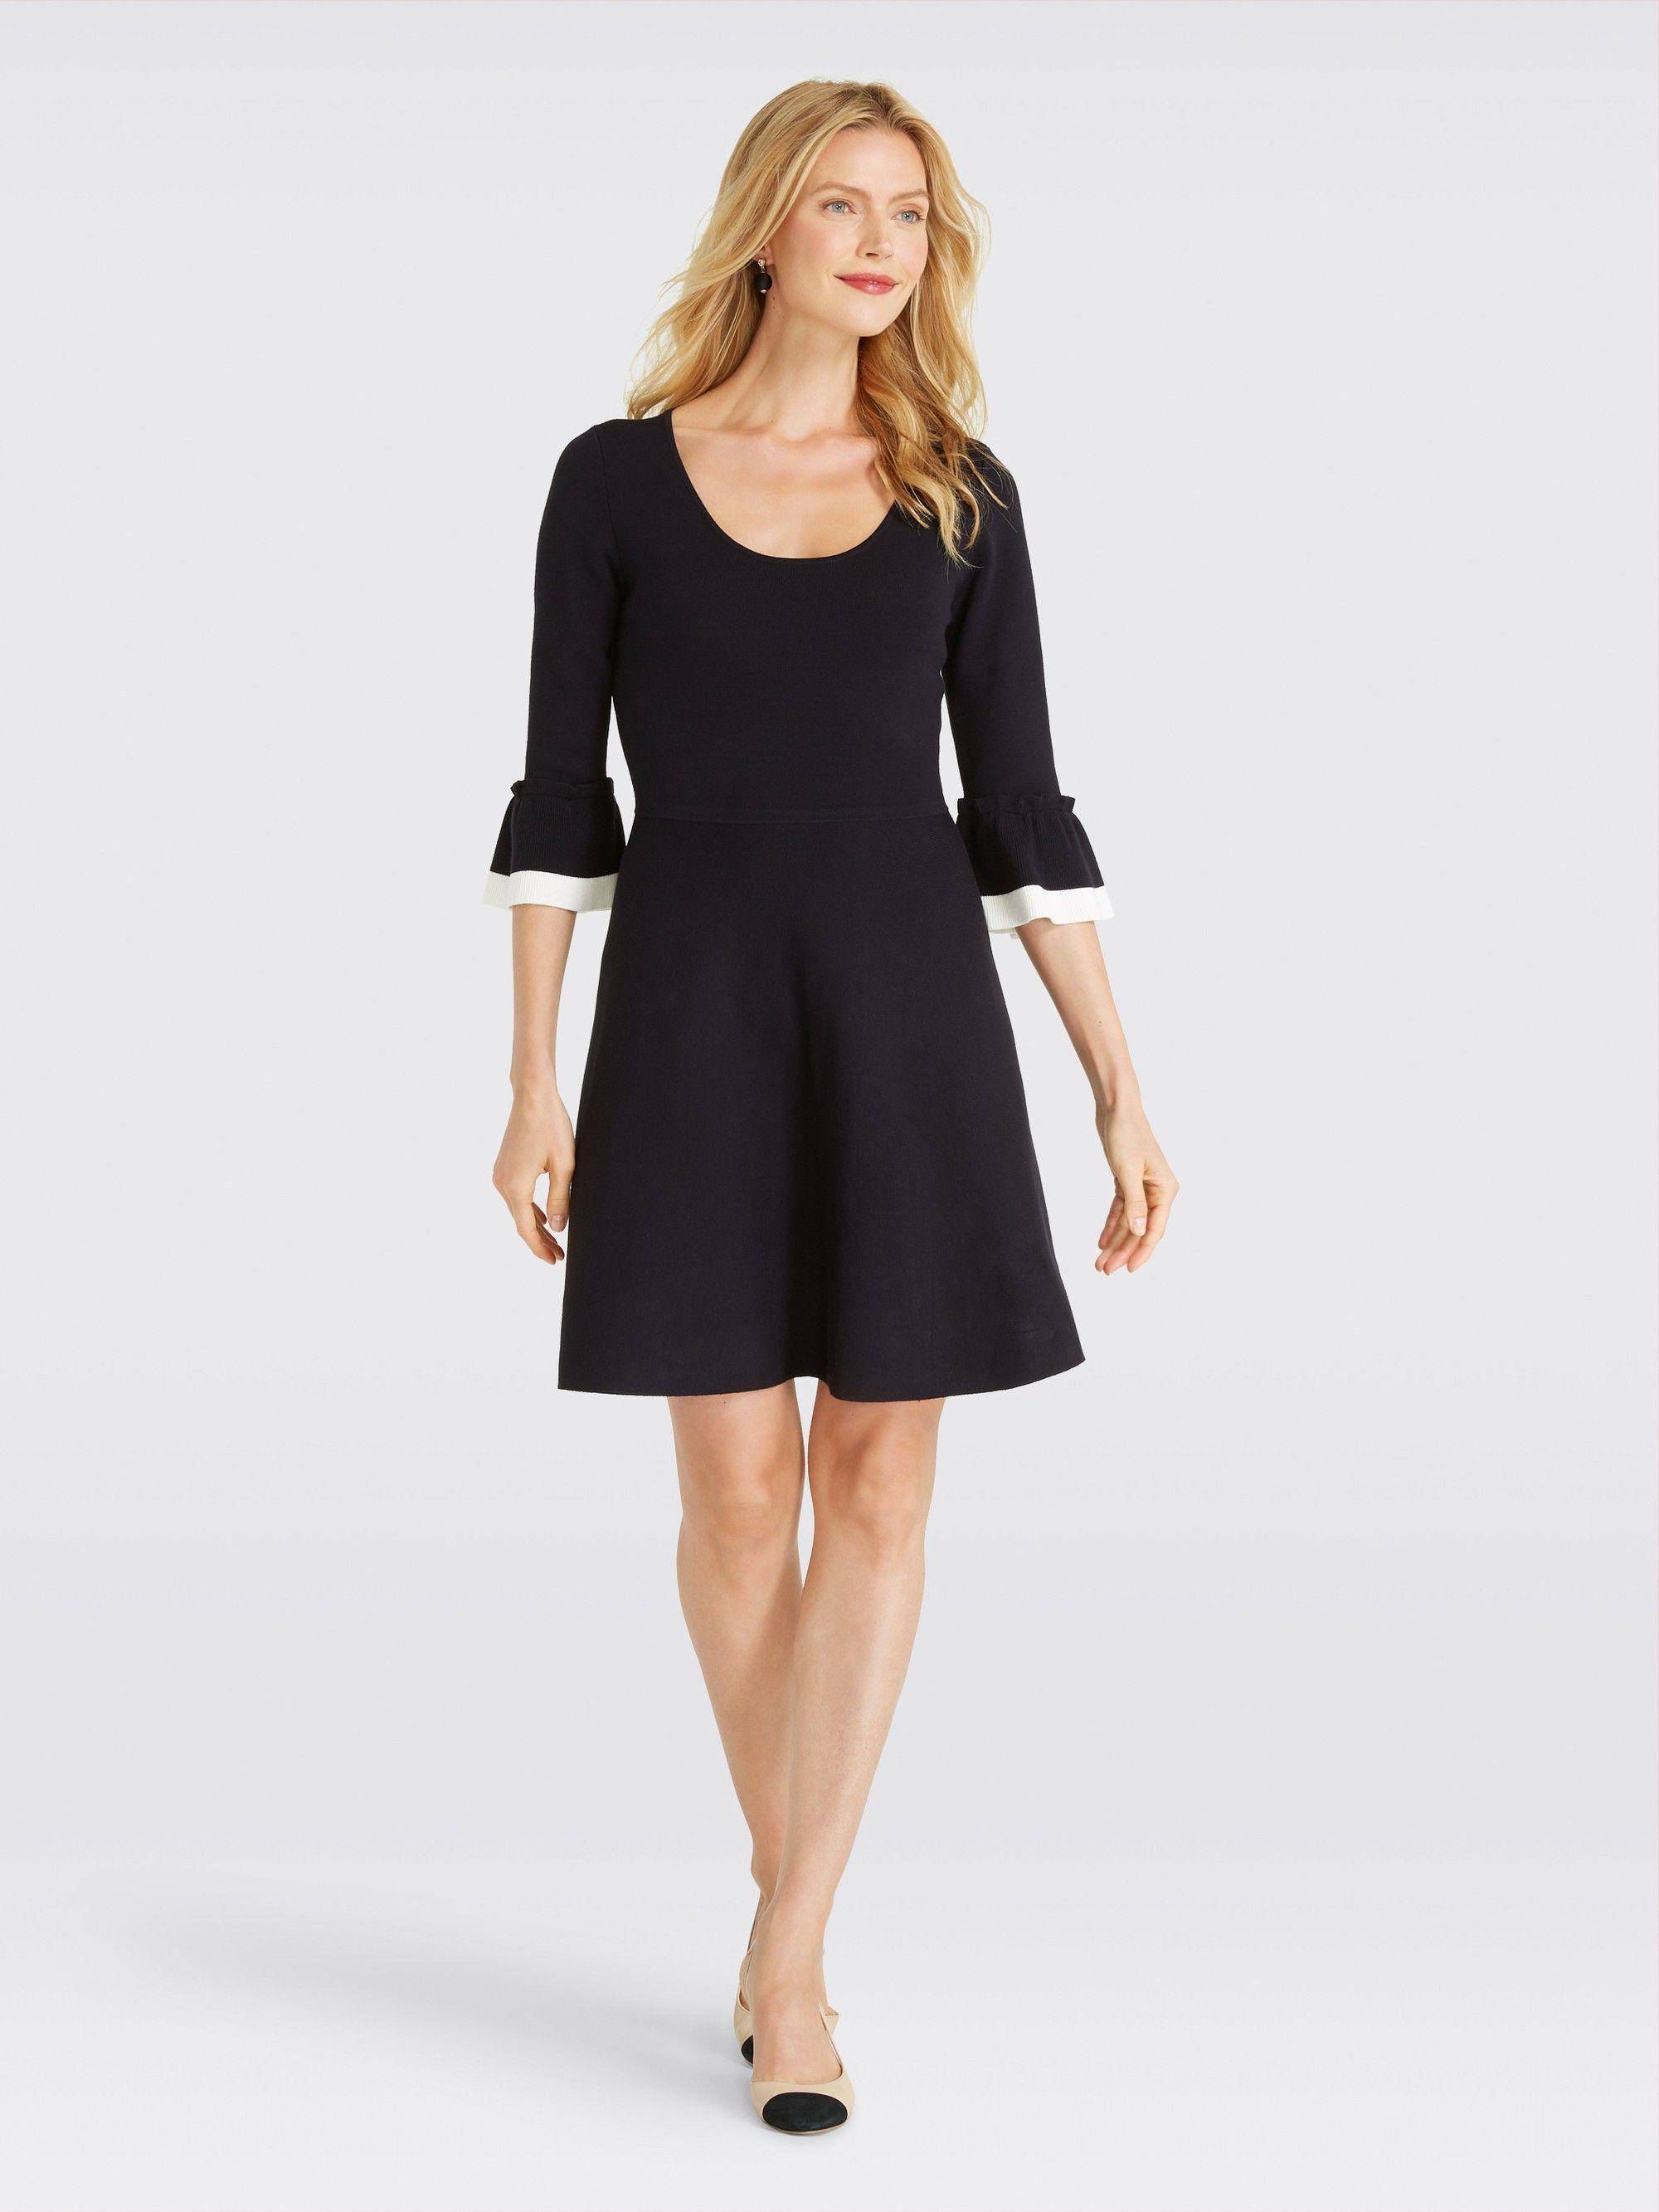 d78dcc94fc1 Flutter Sleeve Sweater Dress in black-0 by Draper James